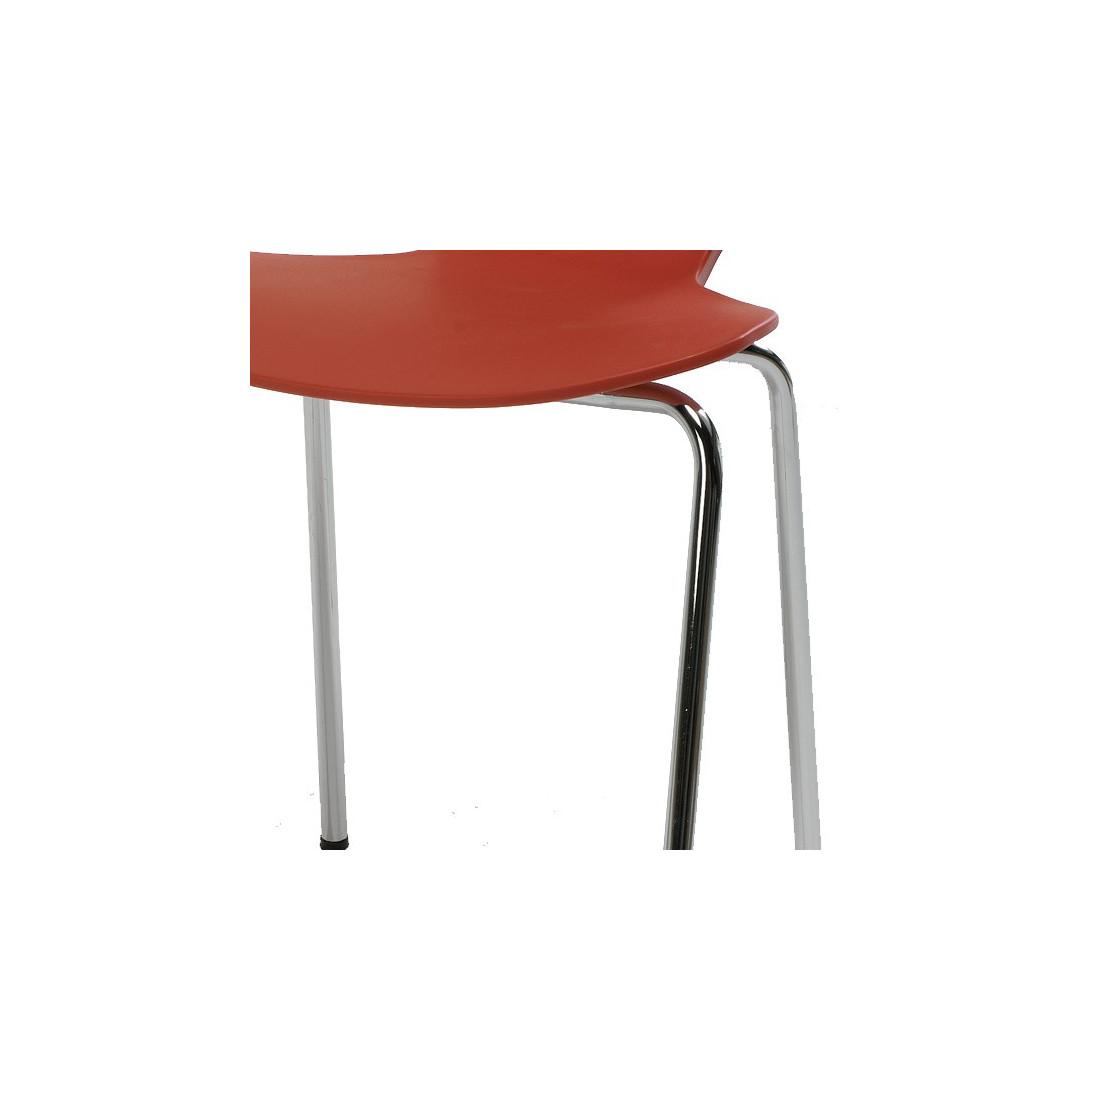 chaises rouge cool chaise chaises rotin ikea new inspirant galerie de chaise de cuisine ikea. Black Bedroom Furniture Sets. Home Design Ideas